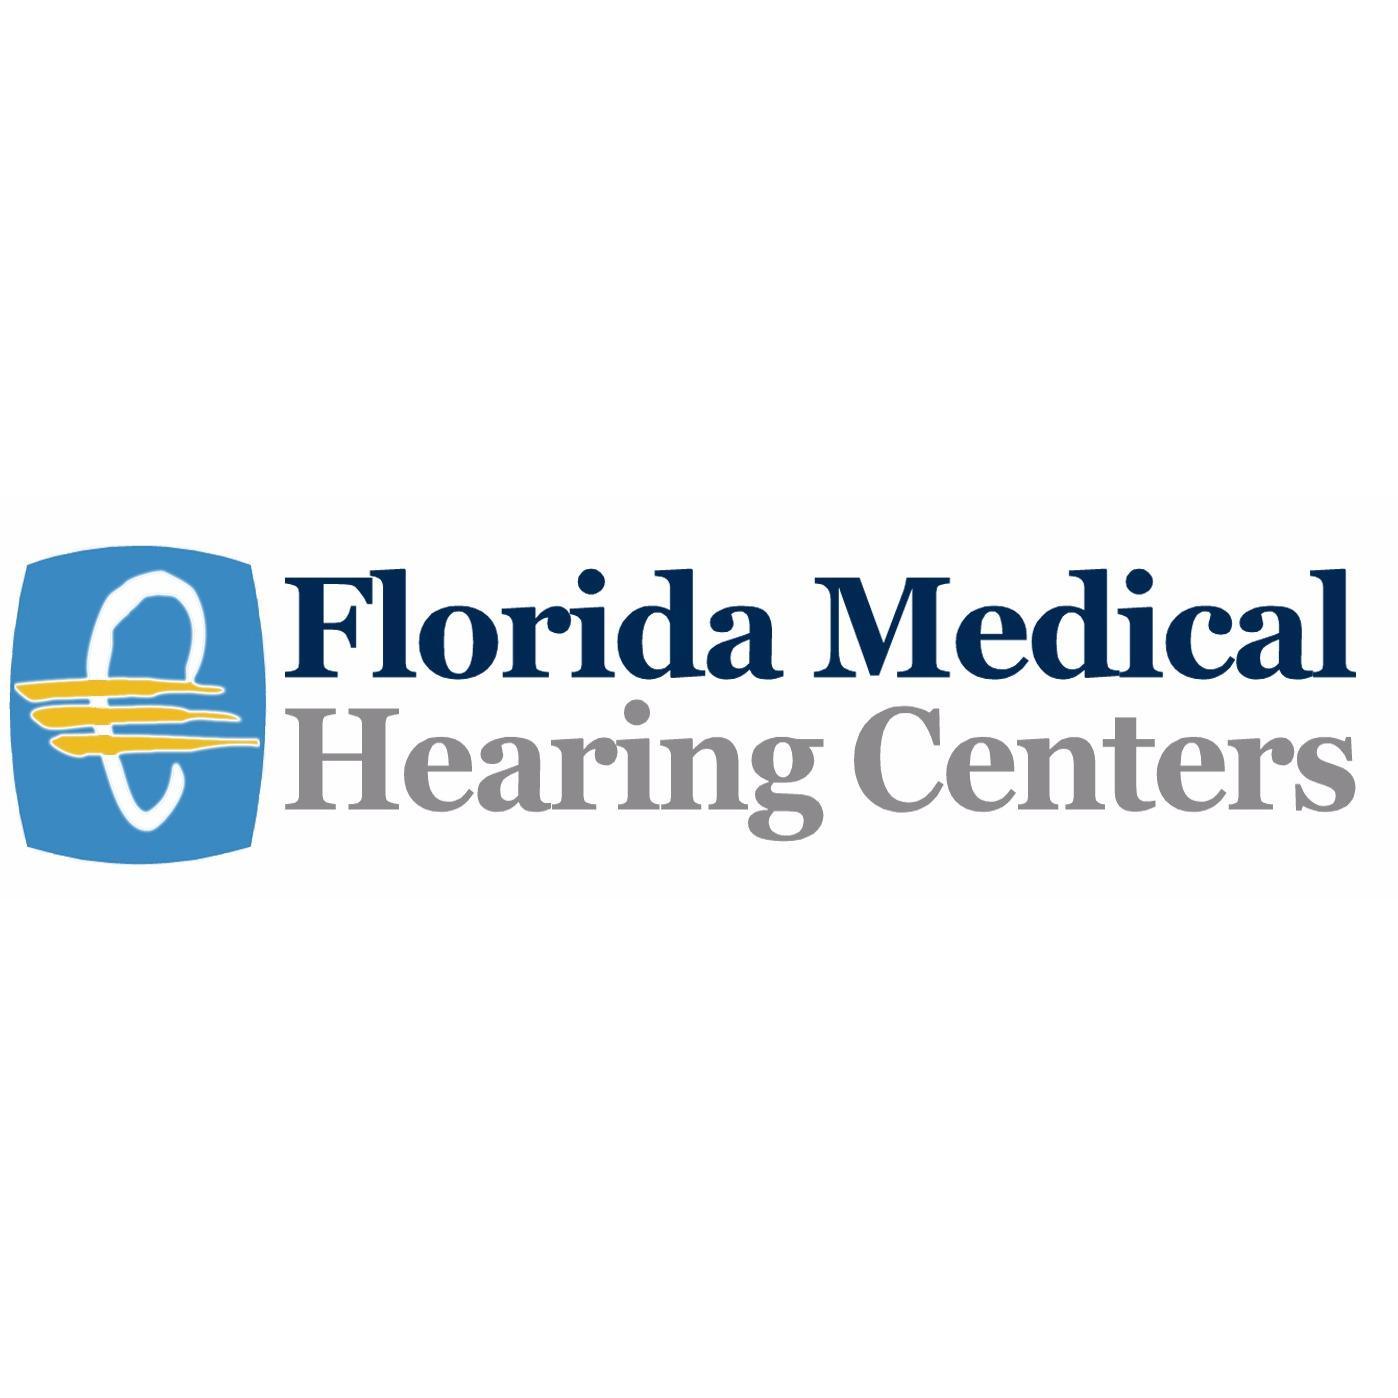 Florida Medical Hearing Centers